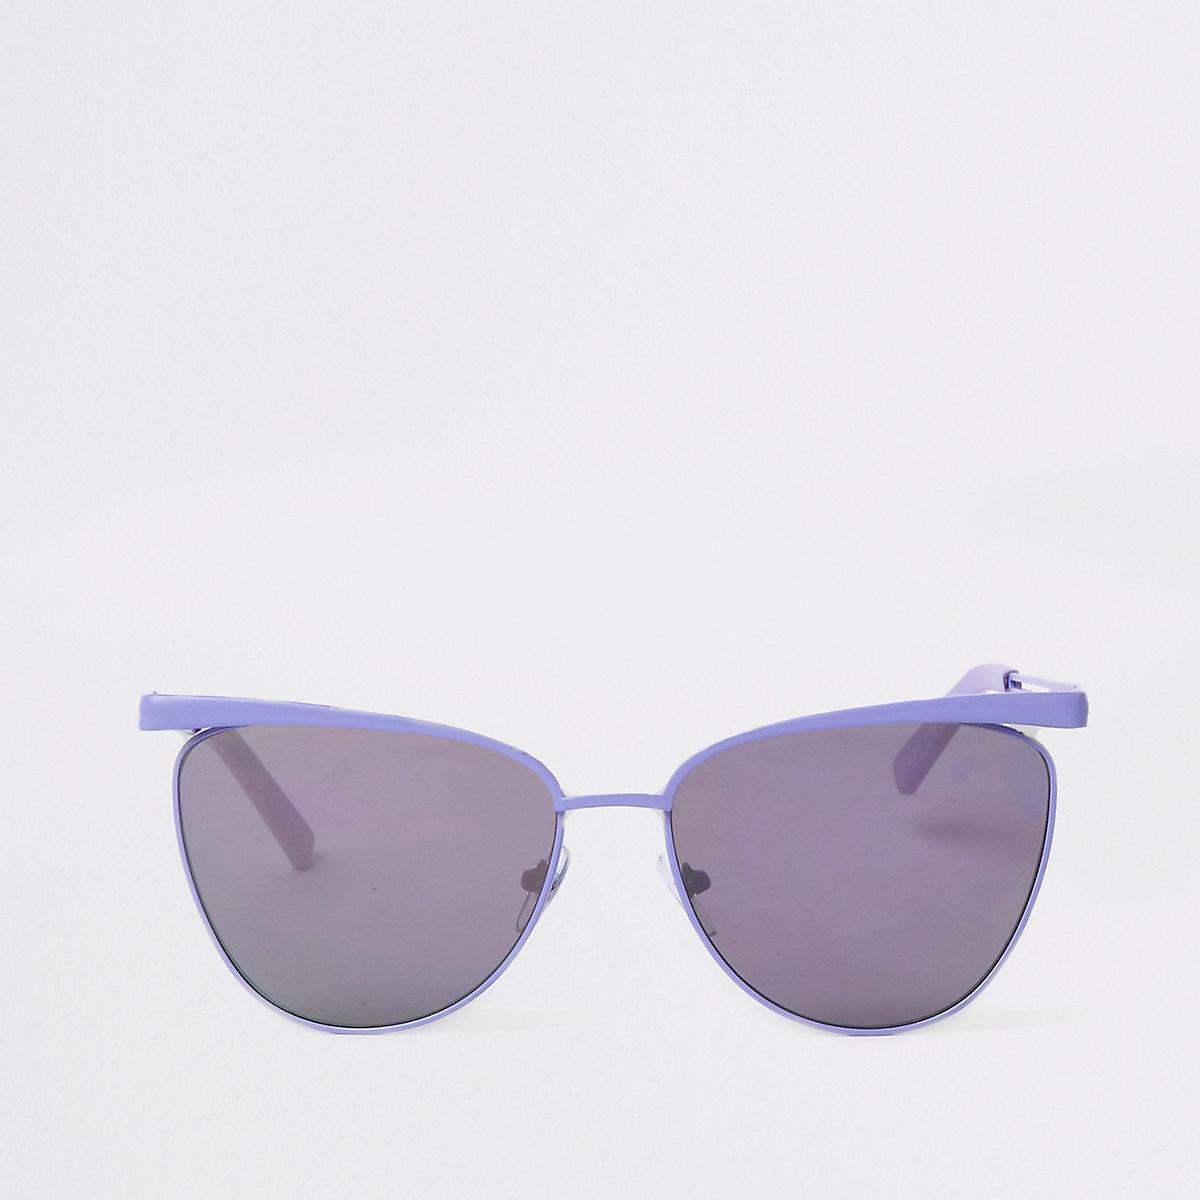 Light purple cat eye sunglasses